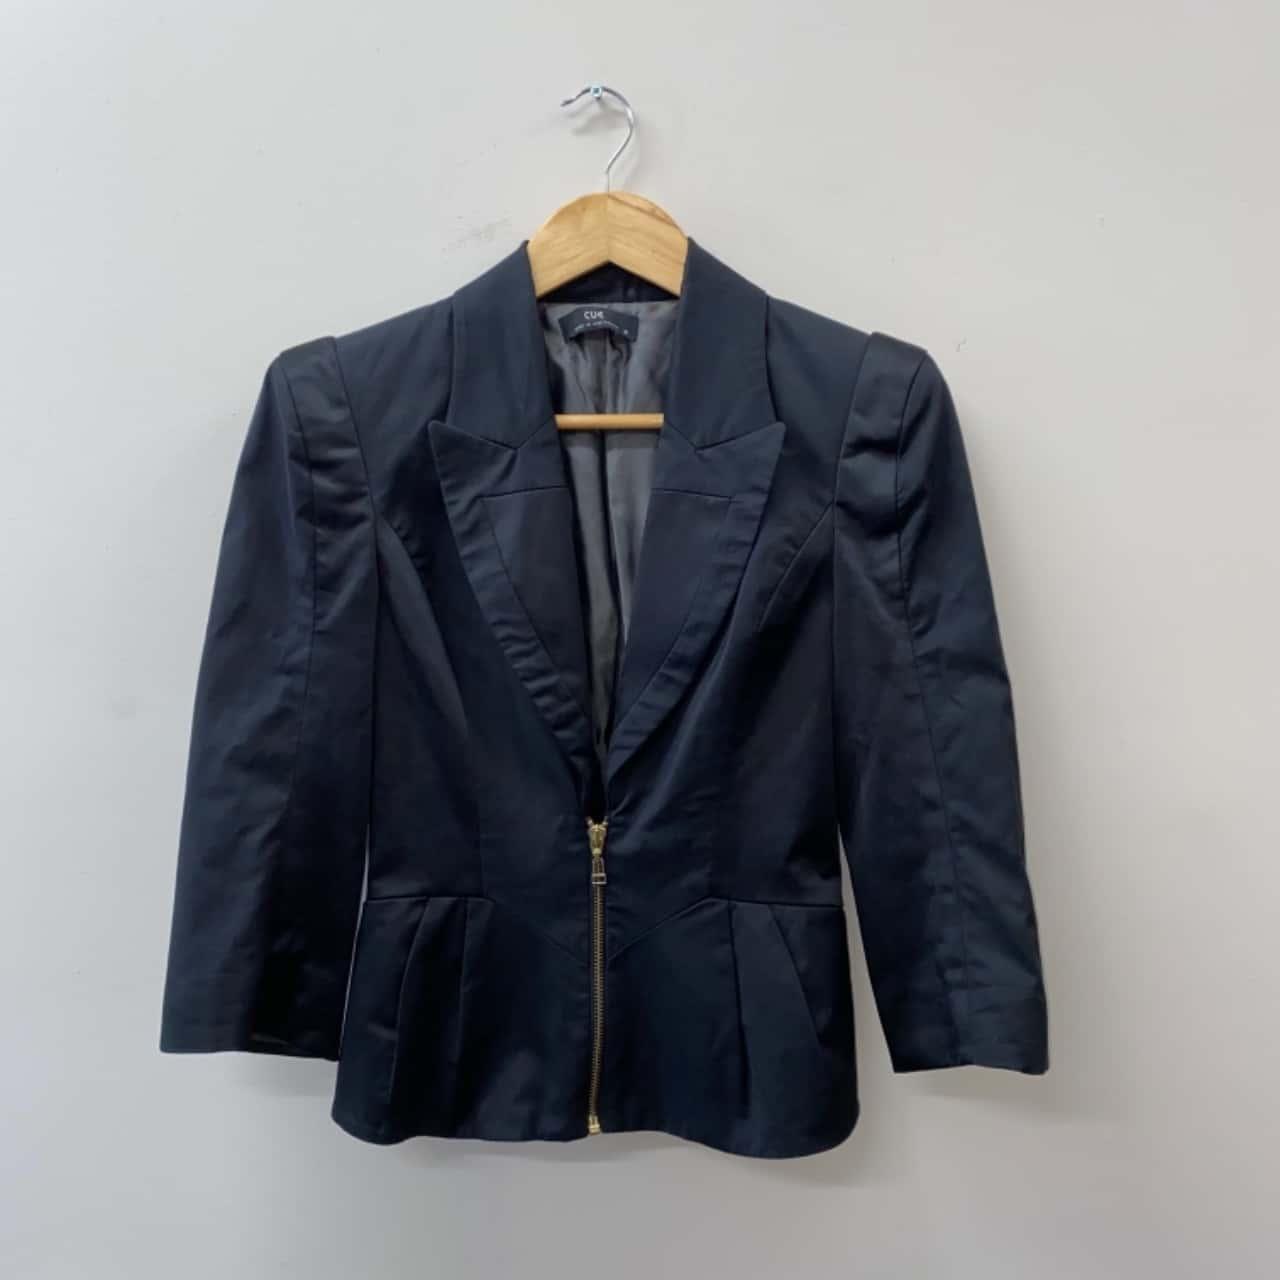 ** REDUCED ** Cue Women's Size 6 Black Jacket